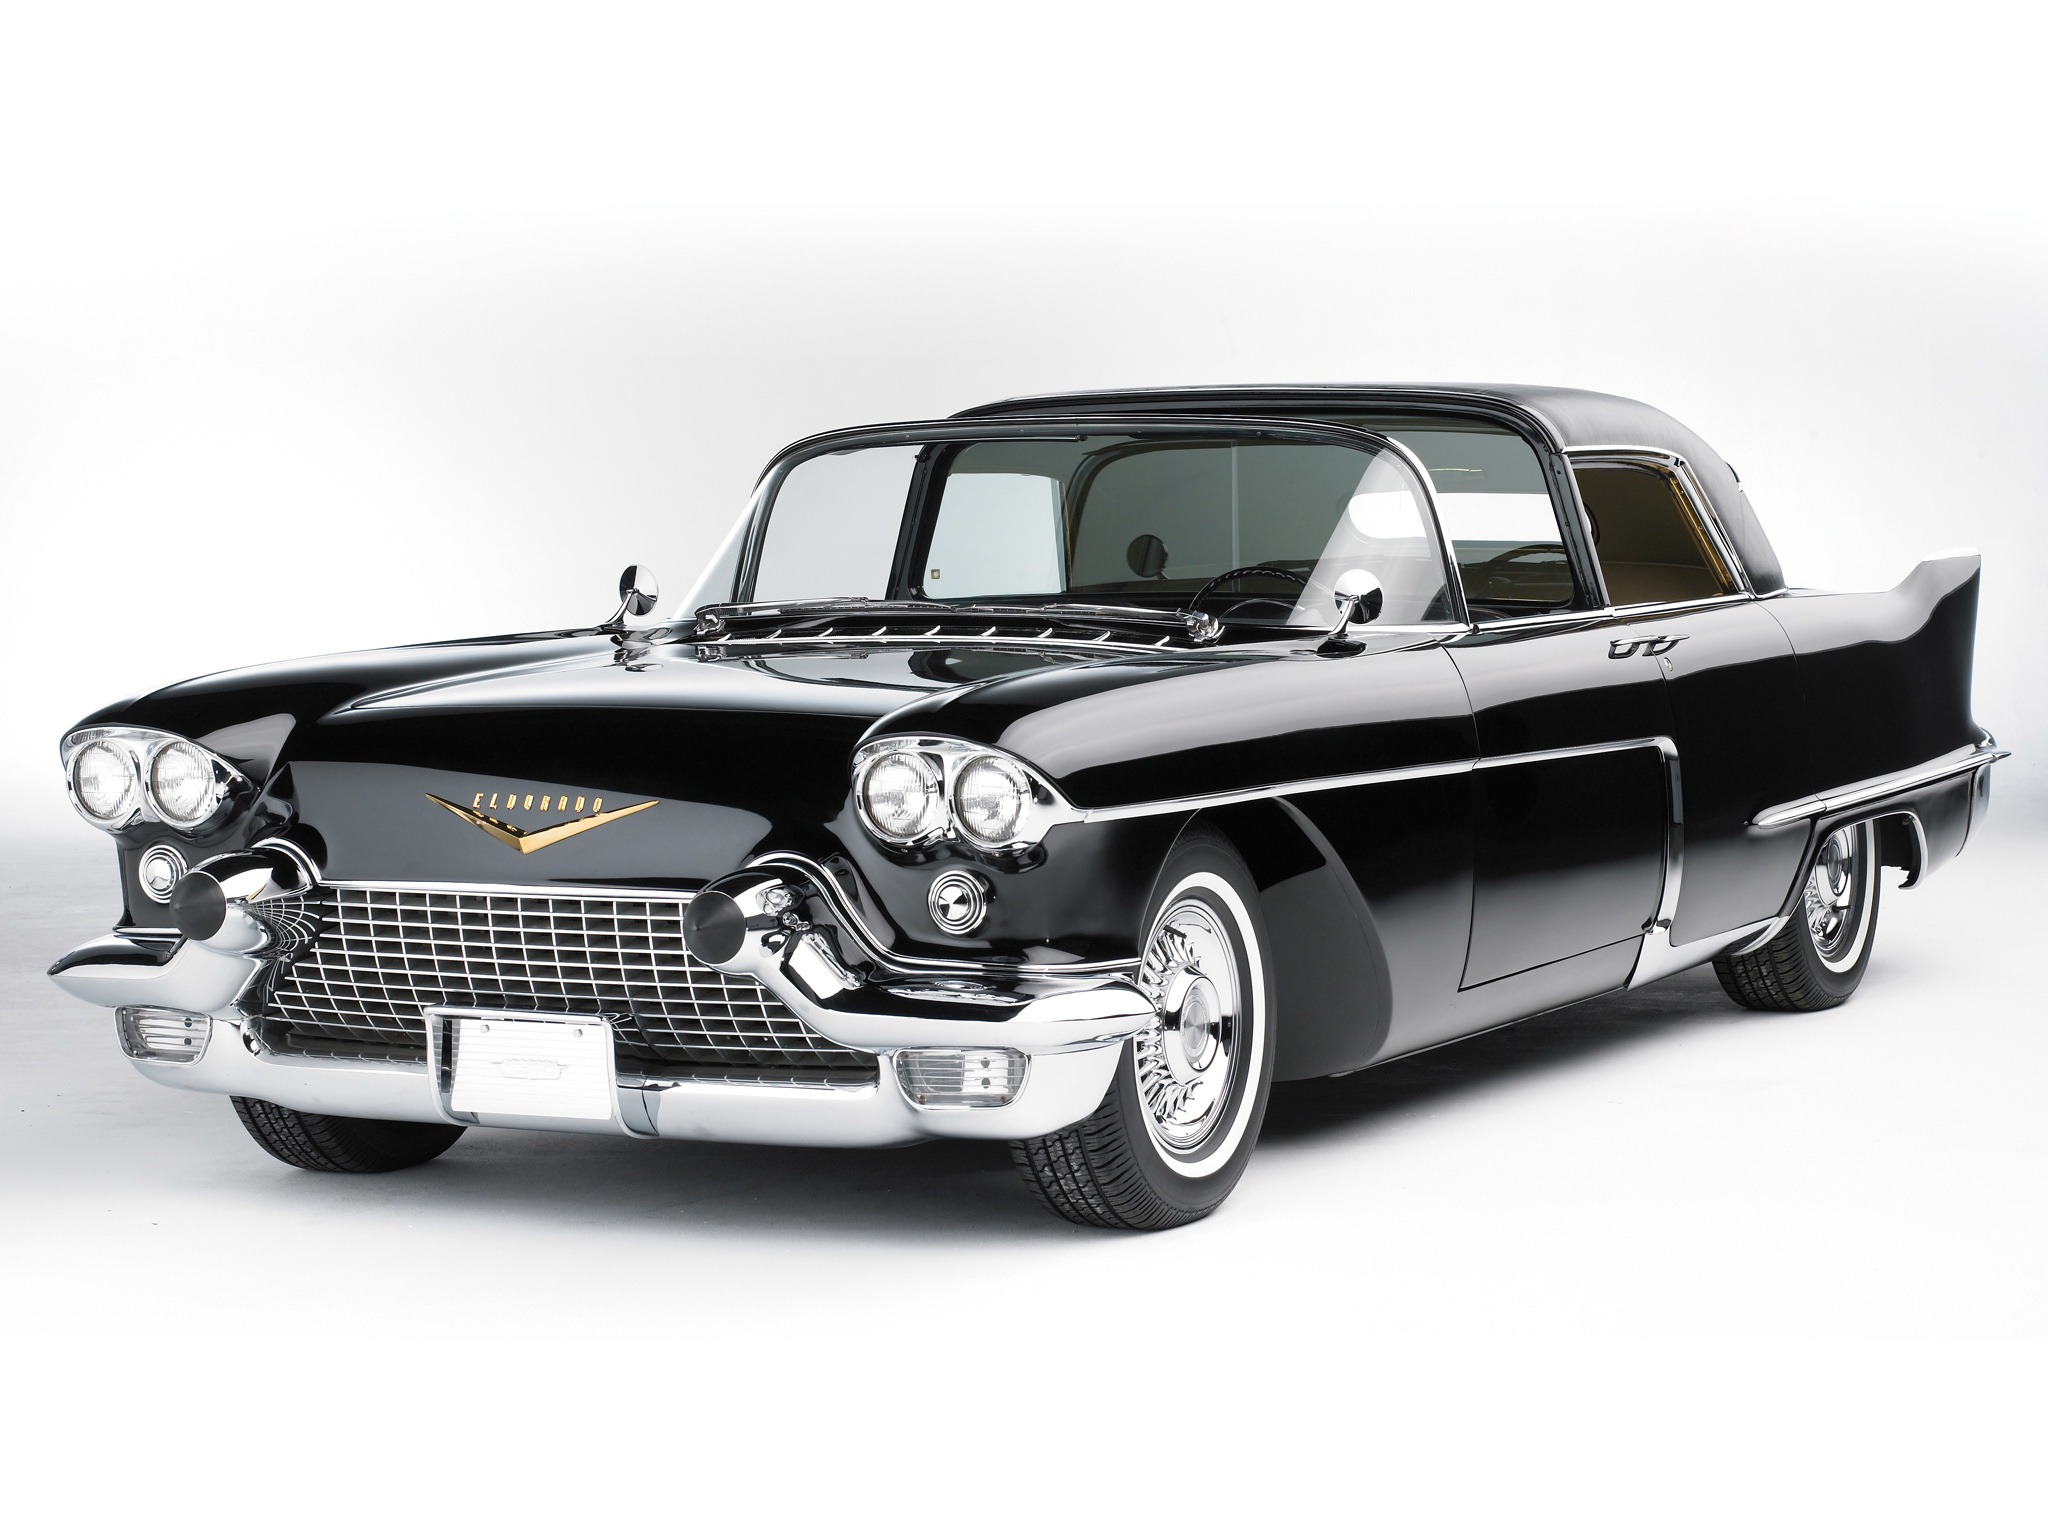 Cadillac Eldorado Brougham Town Car 1956 Old Concept Cars